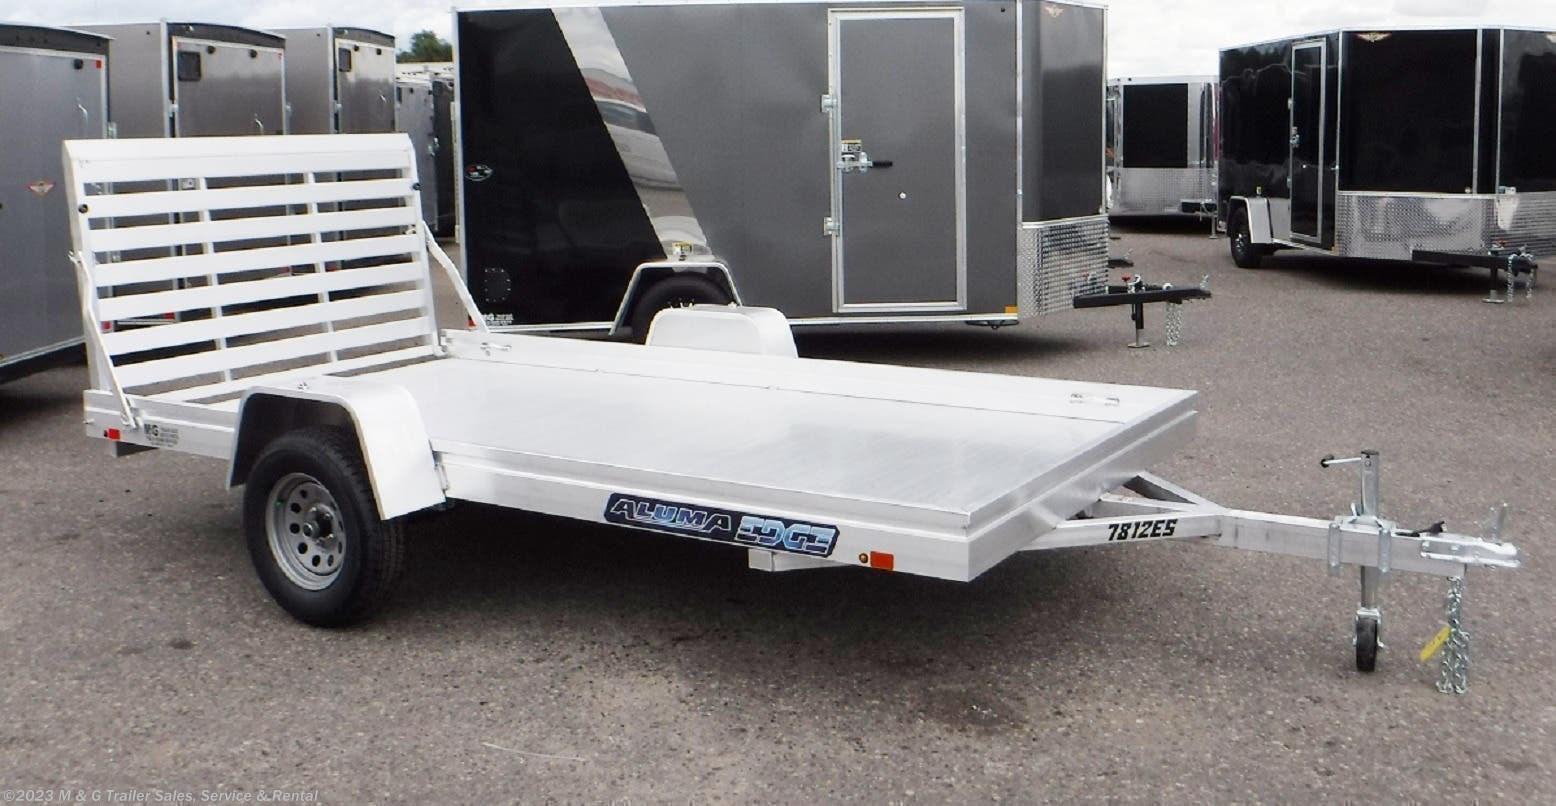 2022 Aluma 7812ES Aluminum Utility Trailer - Stock #232403